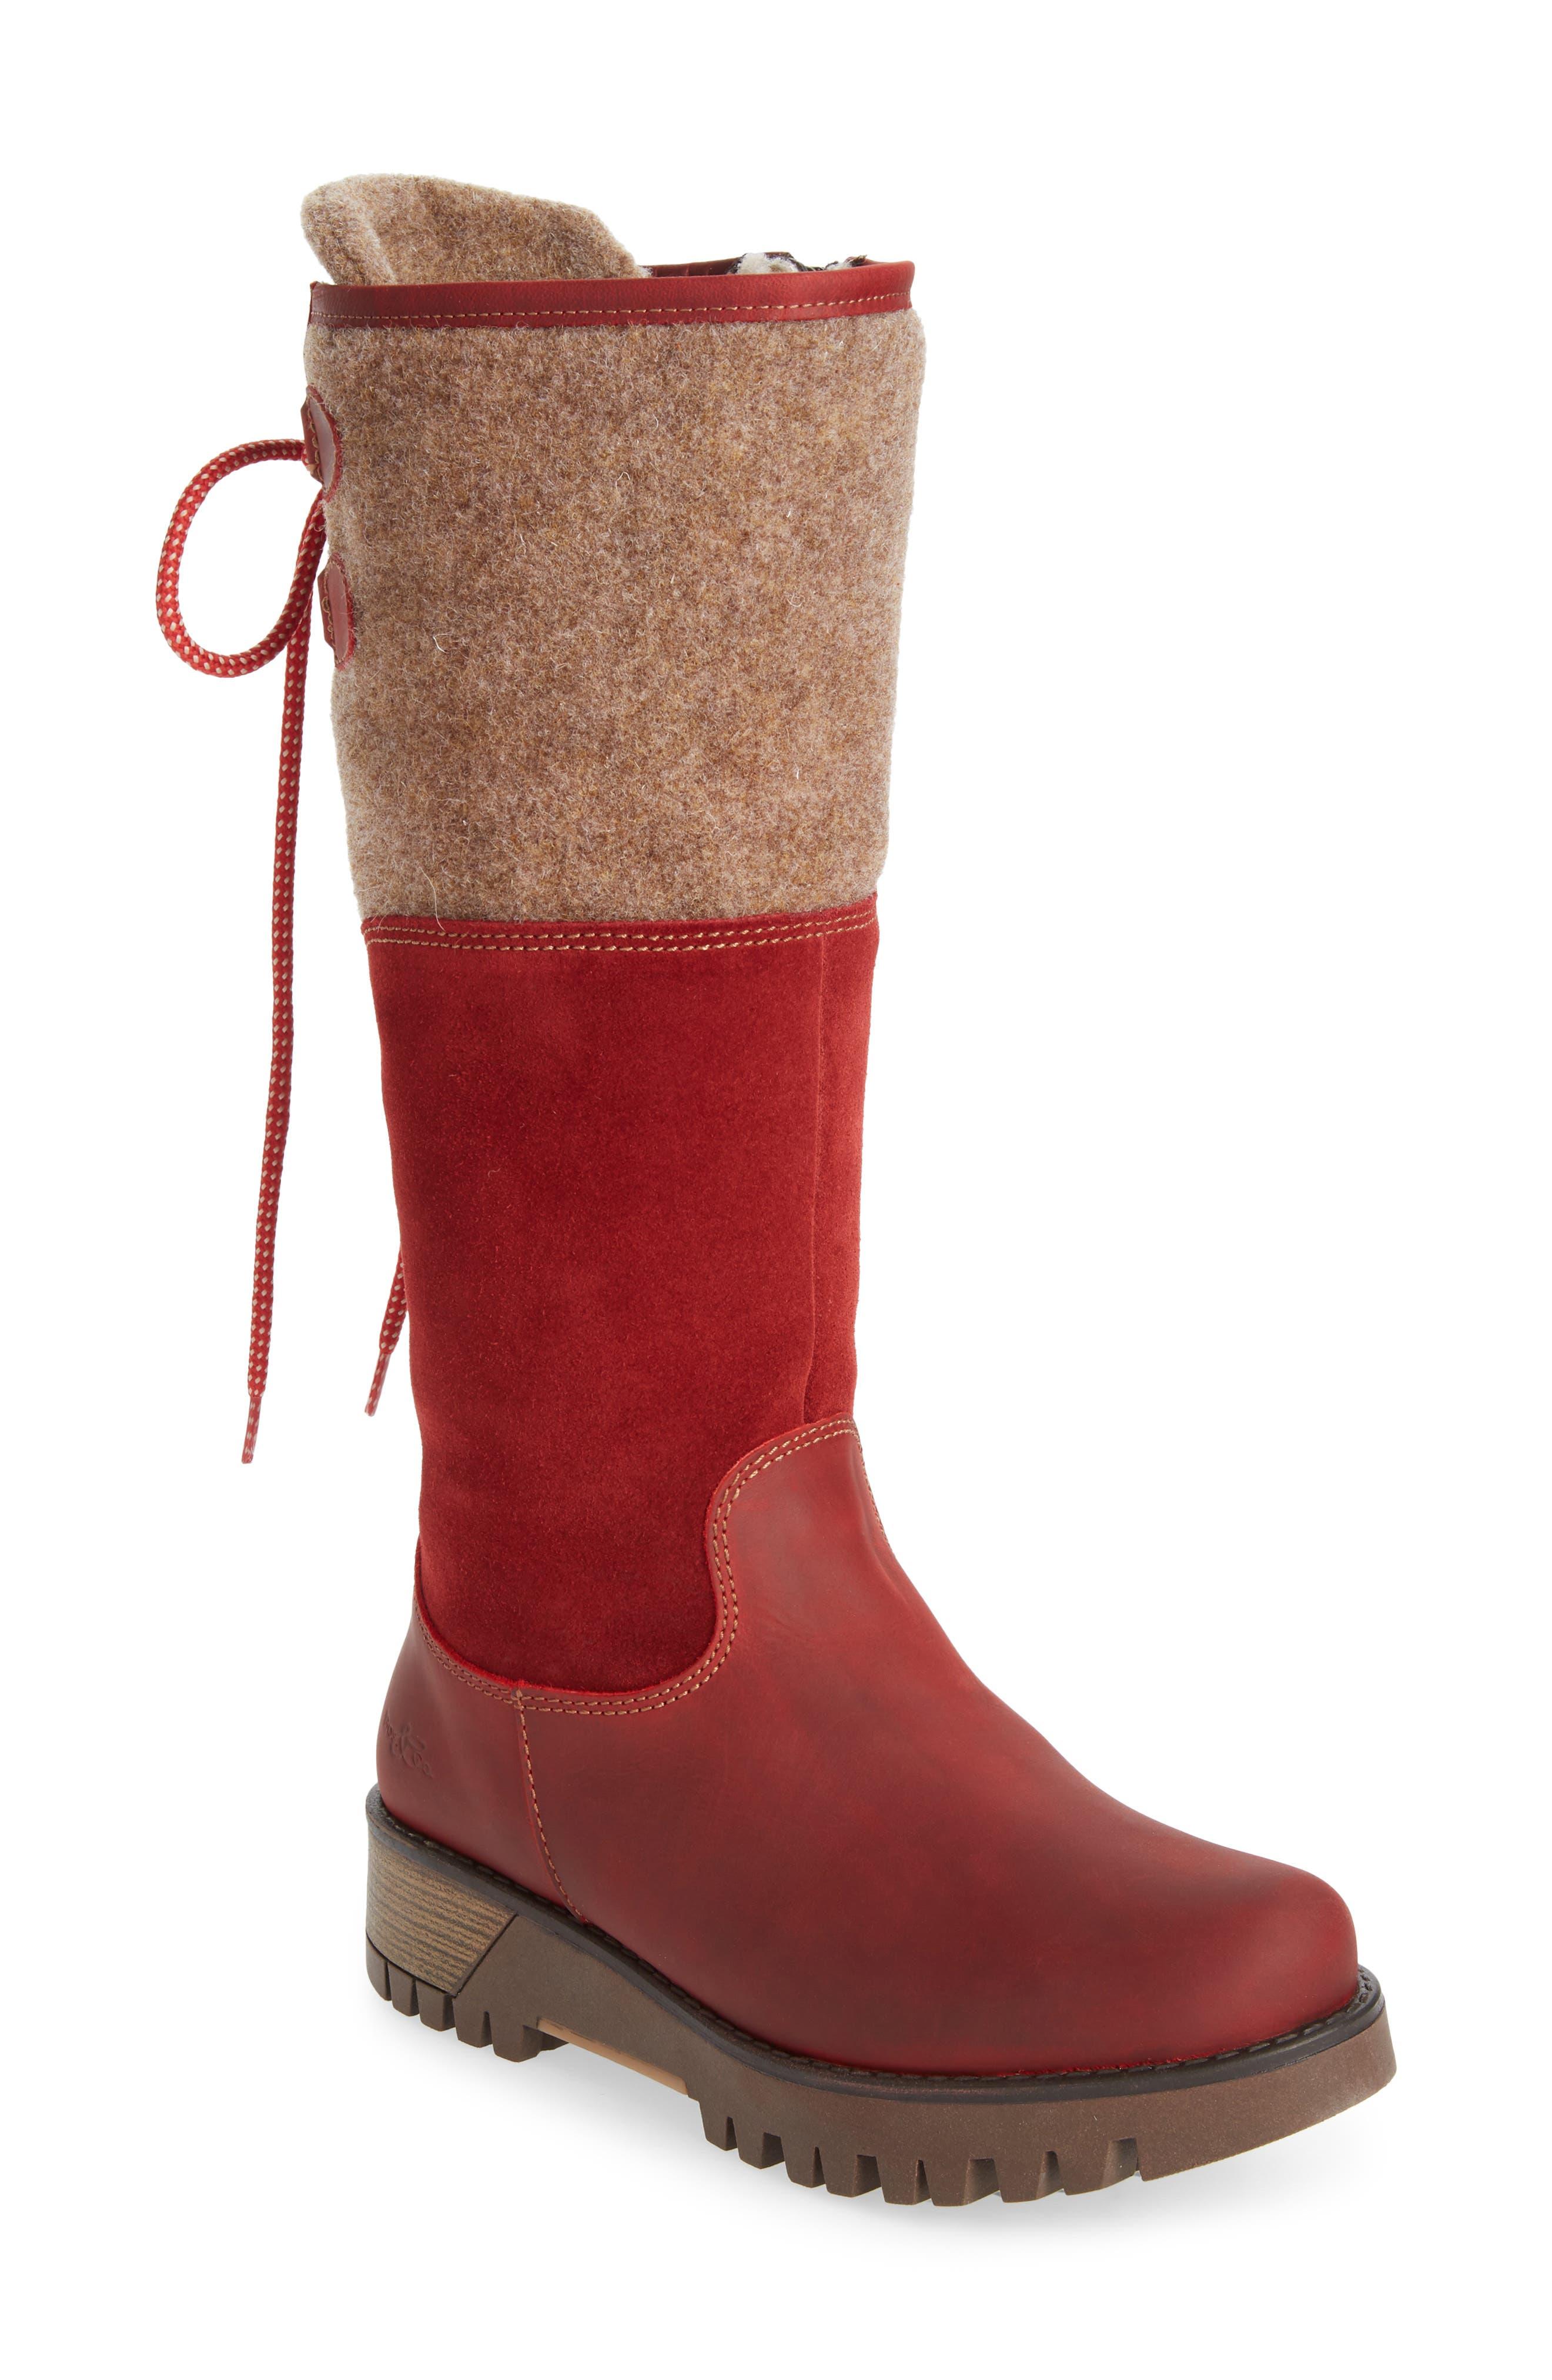 BOS. & CO. 'Ginger' Waterproof Mid Calf Platform Boot, Main, color, RED/ SCARLET WOOL